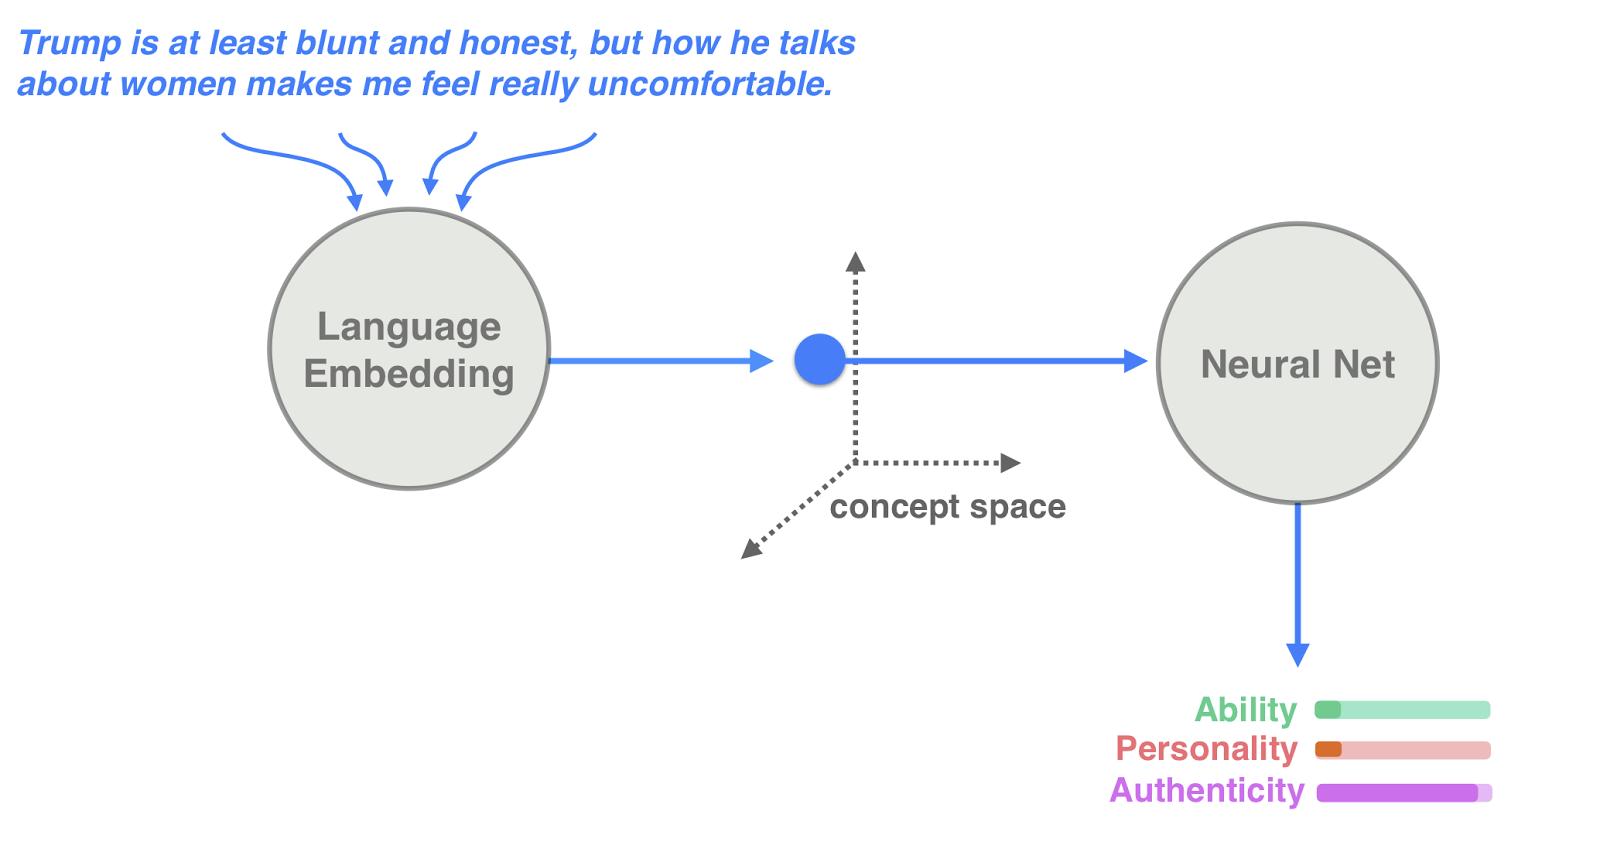 language embedding